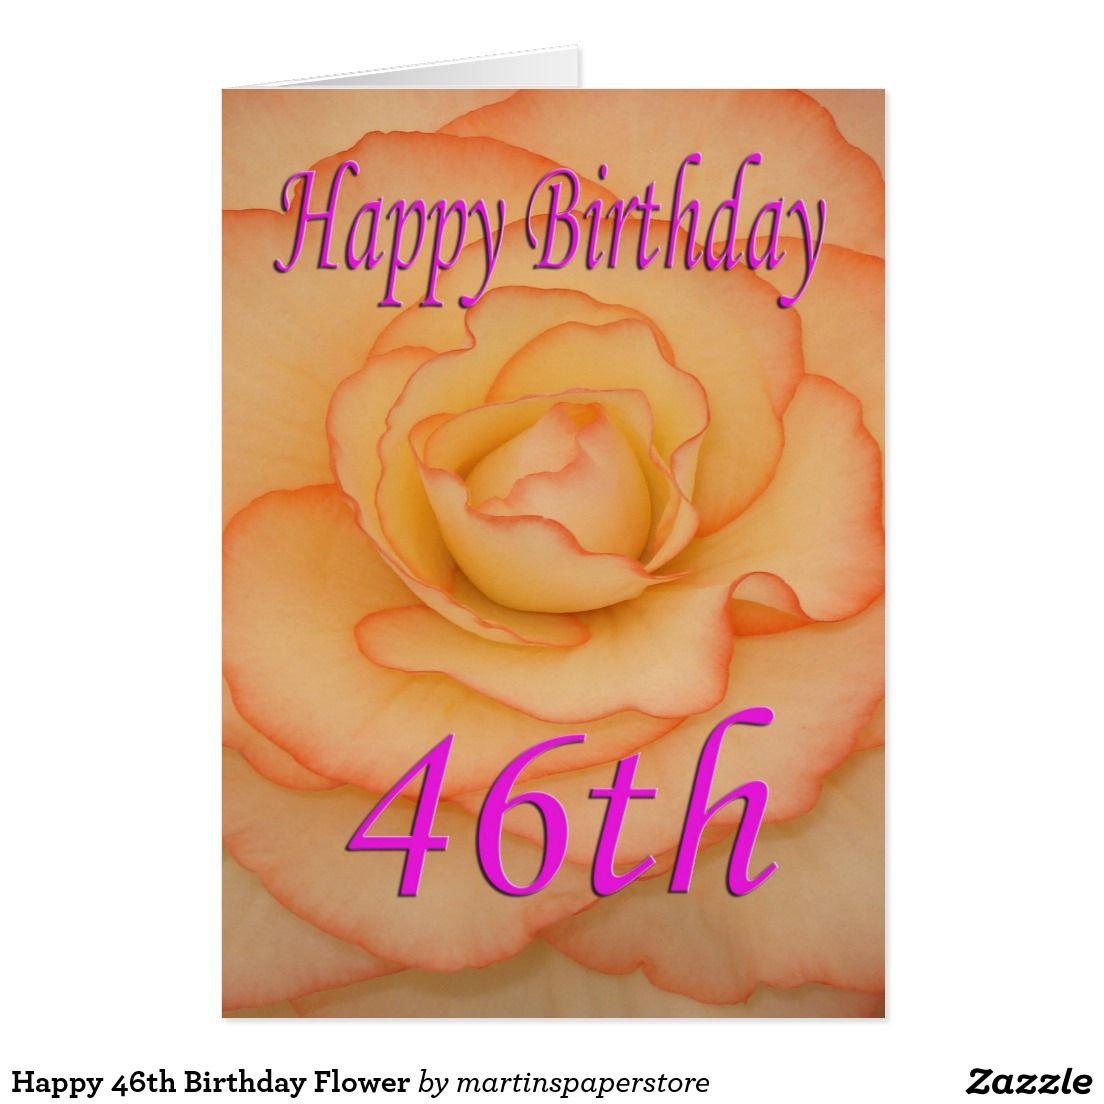 Happy th birthday flower card all things zazzle pinterest